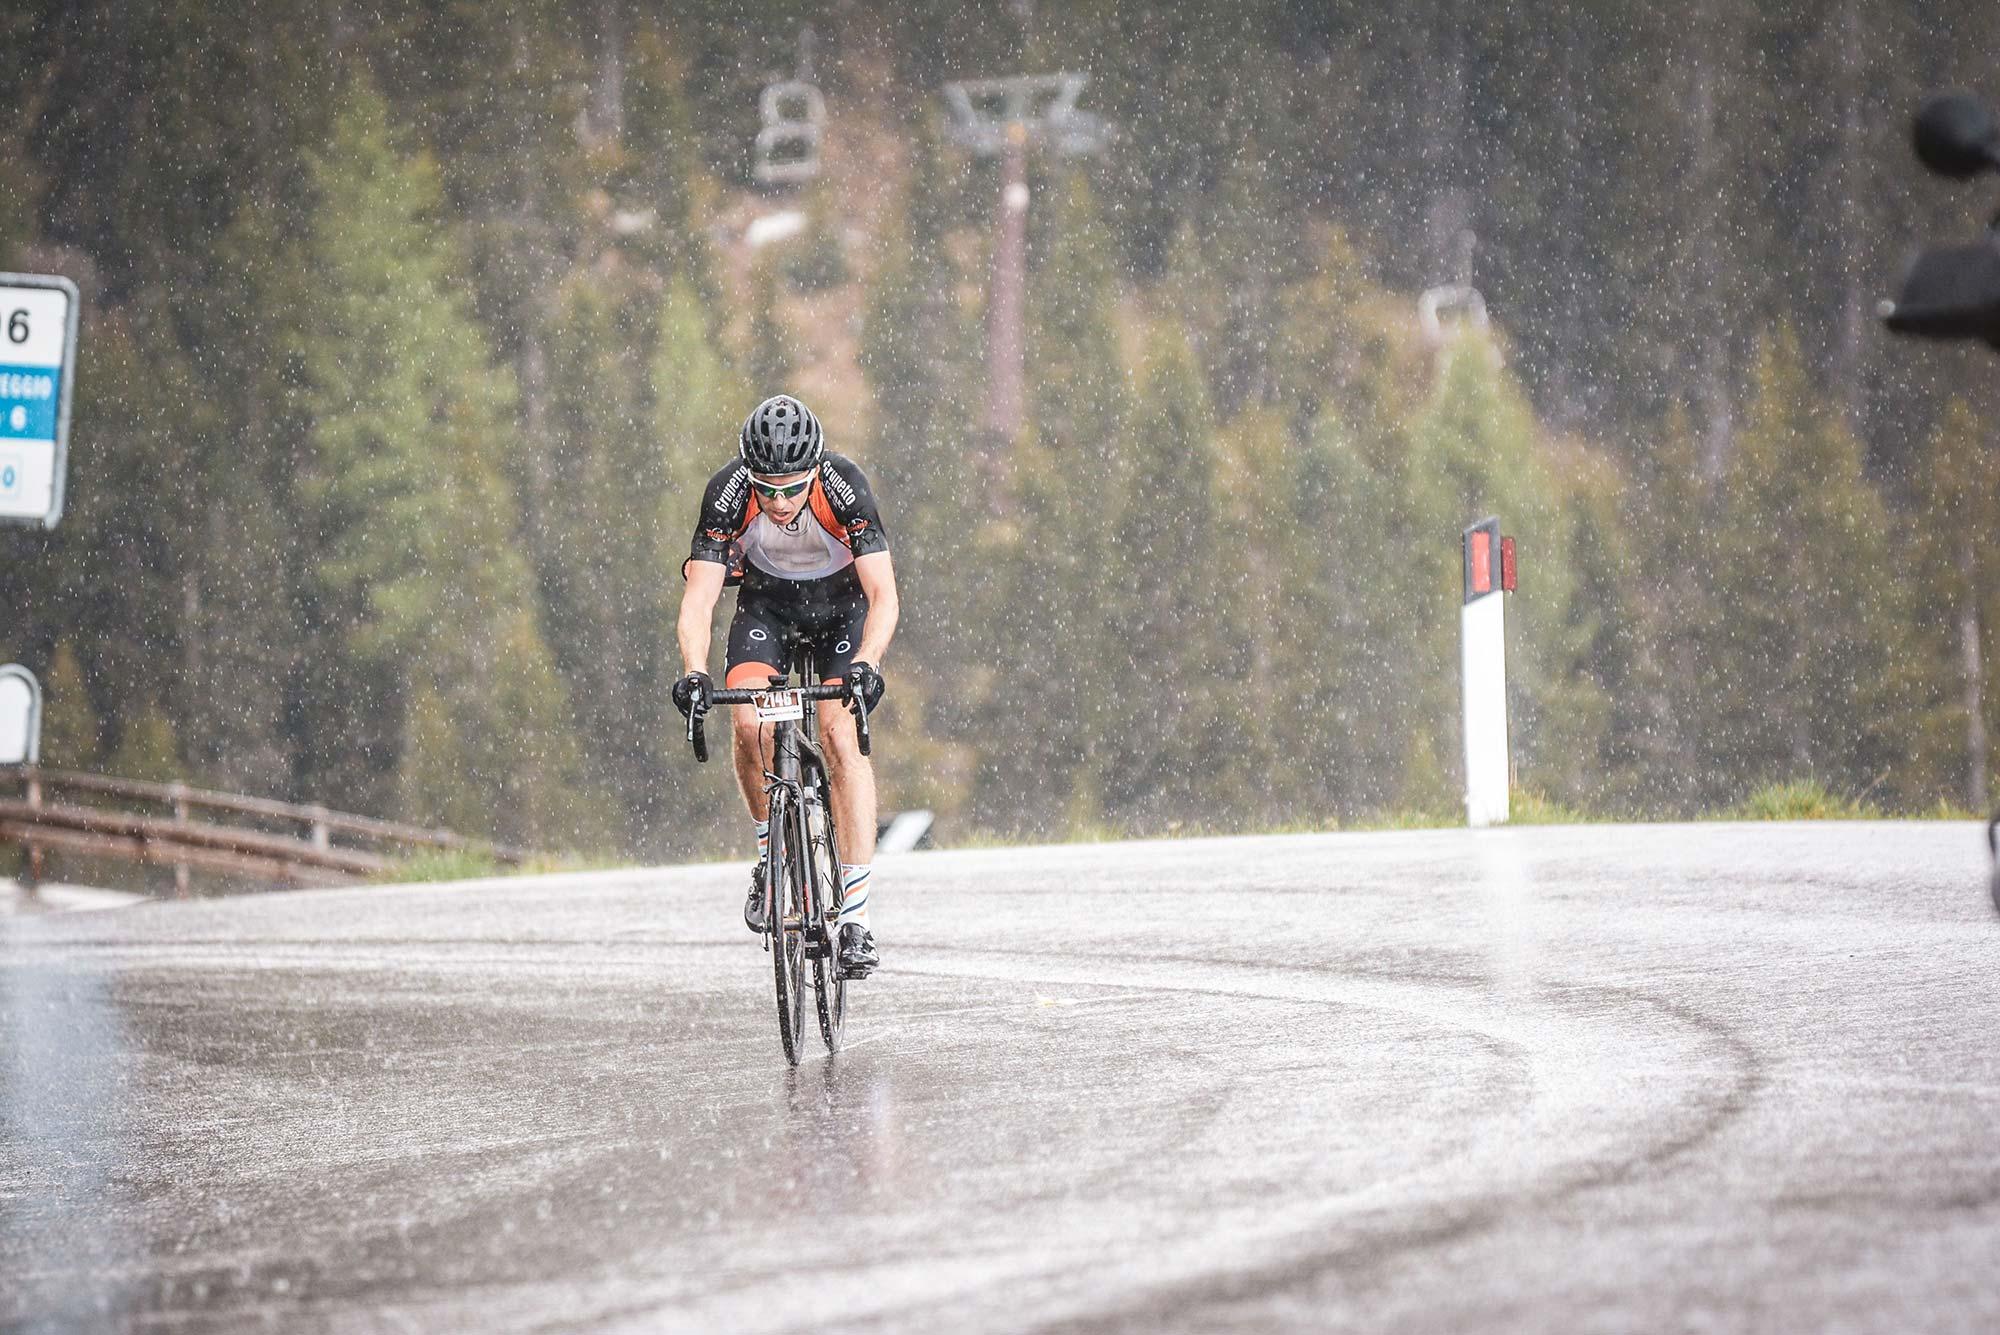 Coach Sebastian racing in the rain